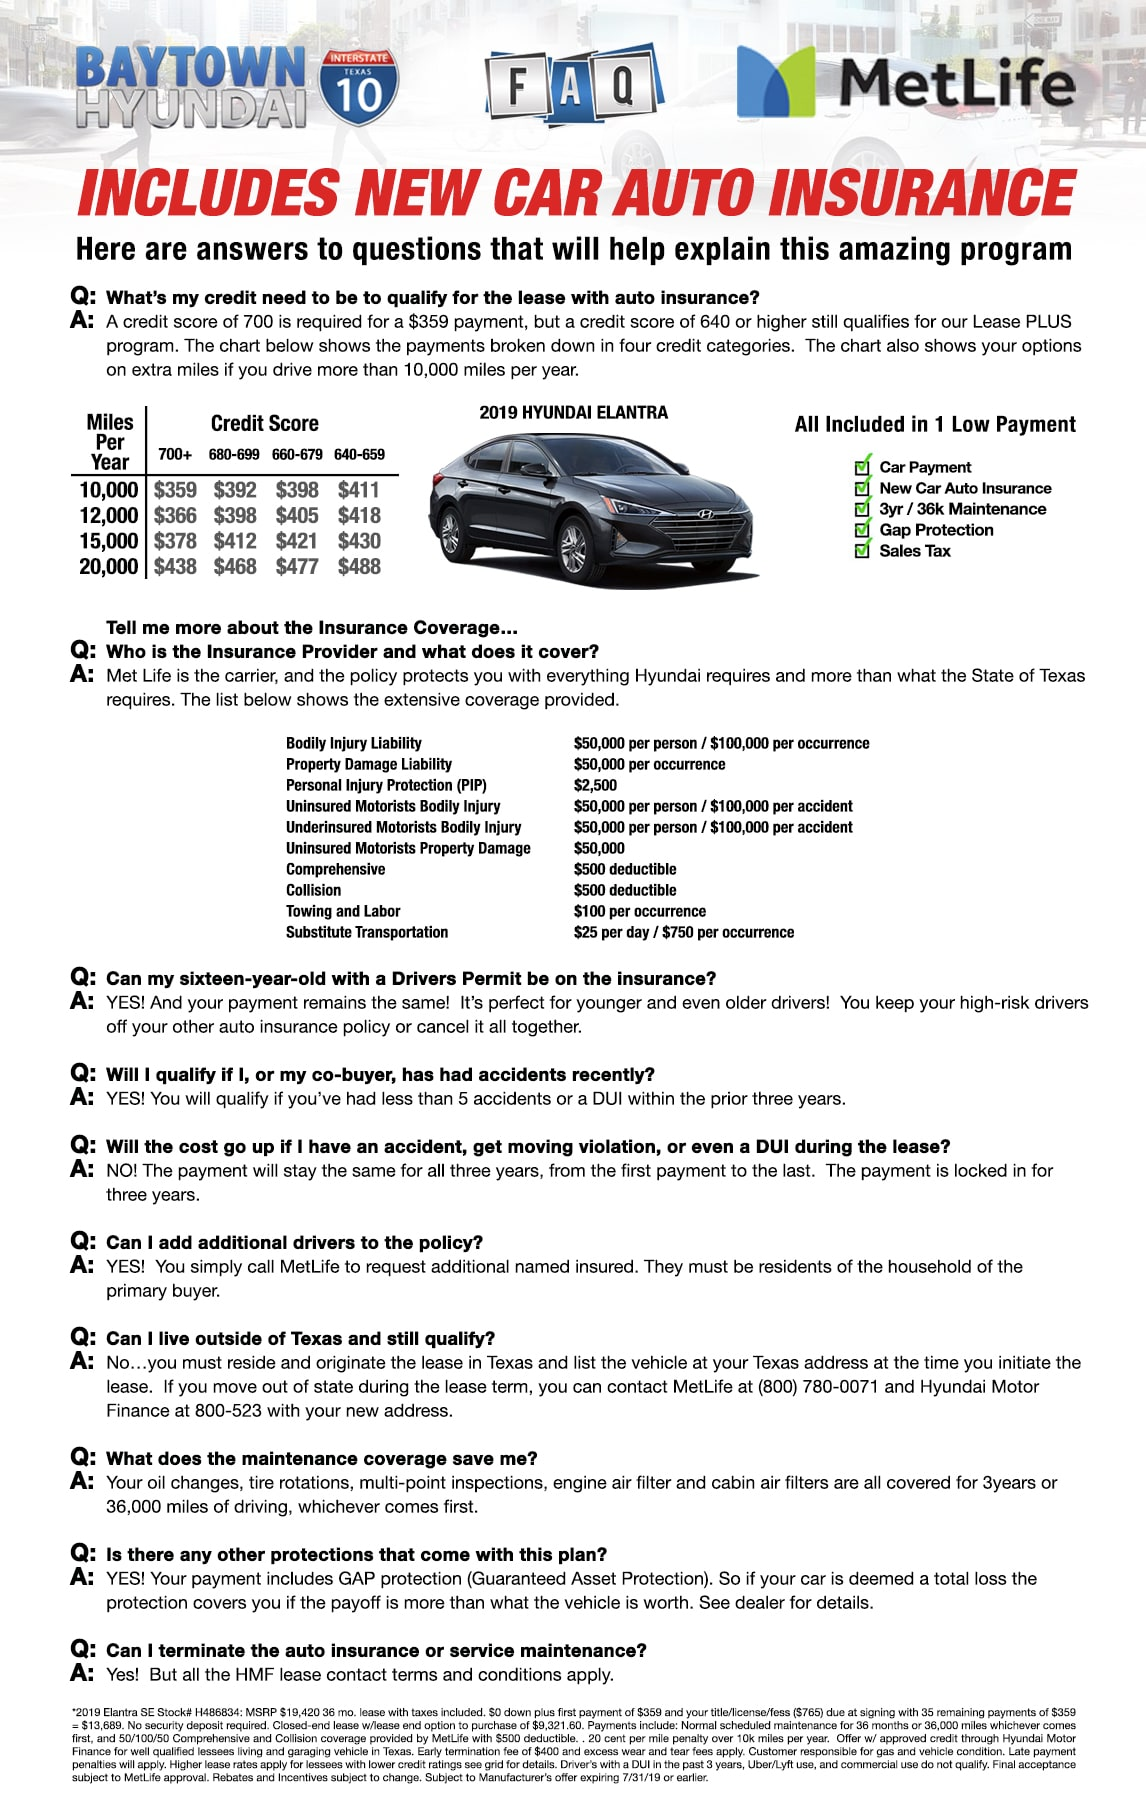 Lease Bundle Elantra Faq Baytown Hyundai